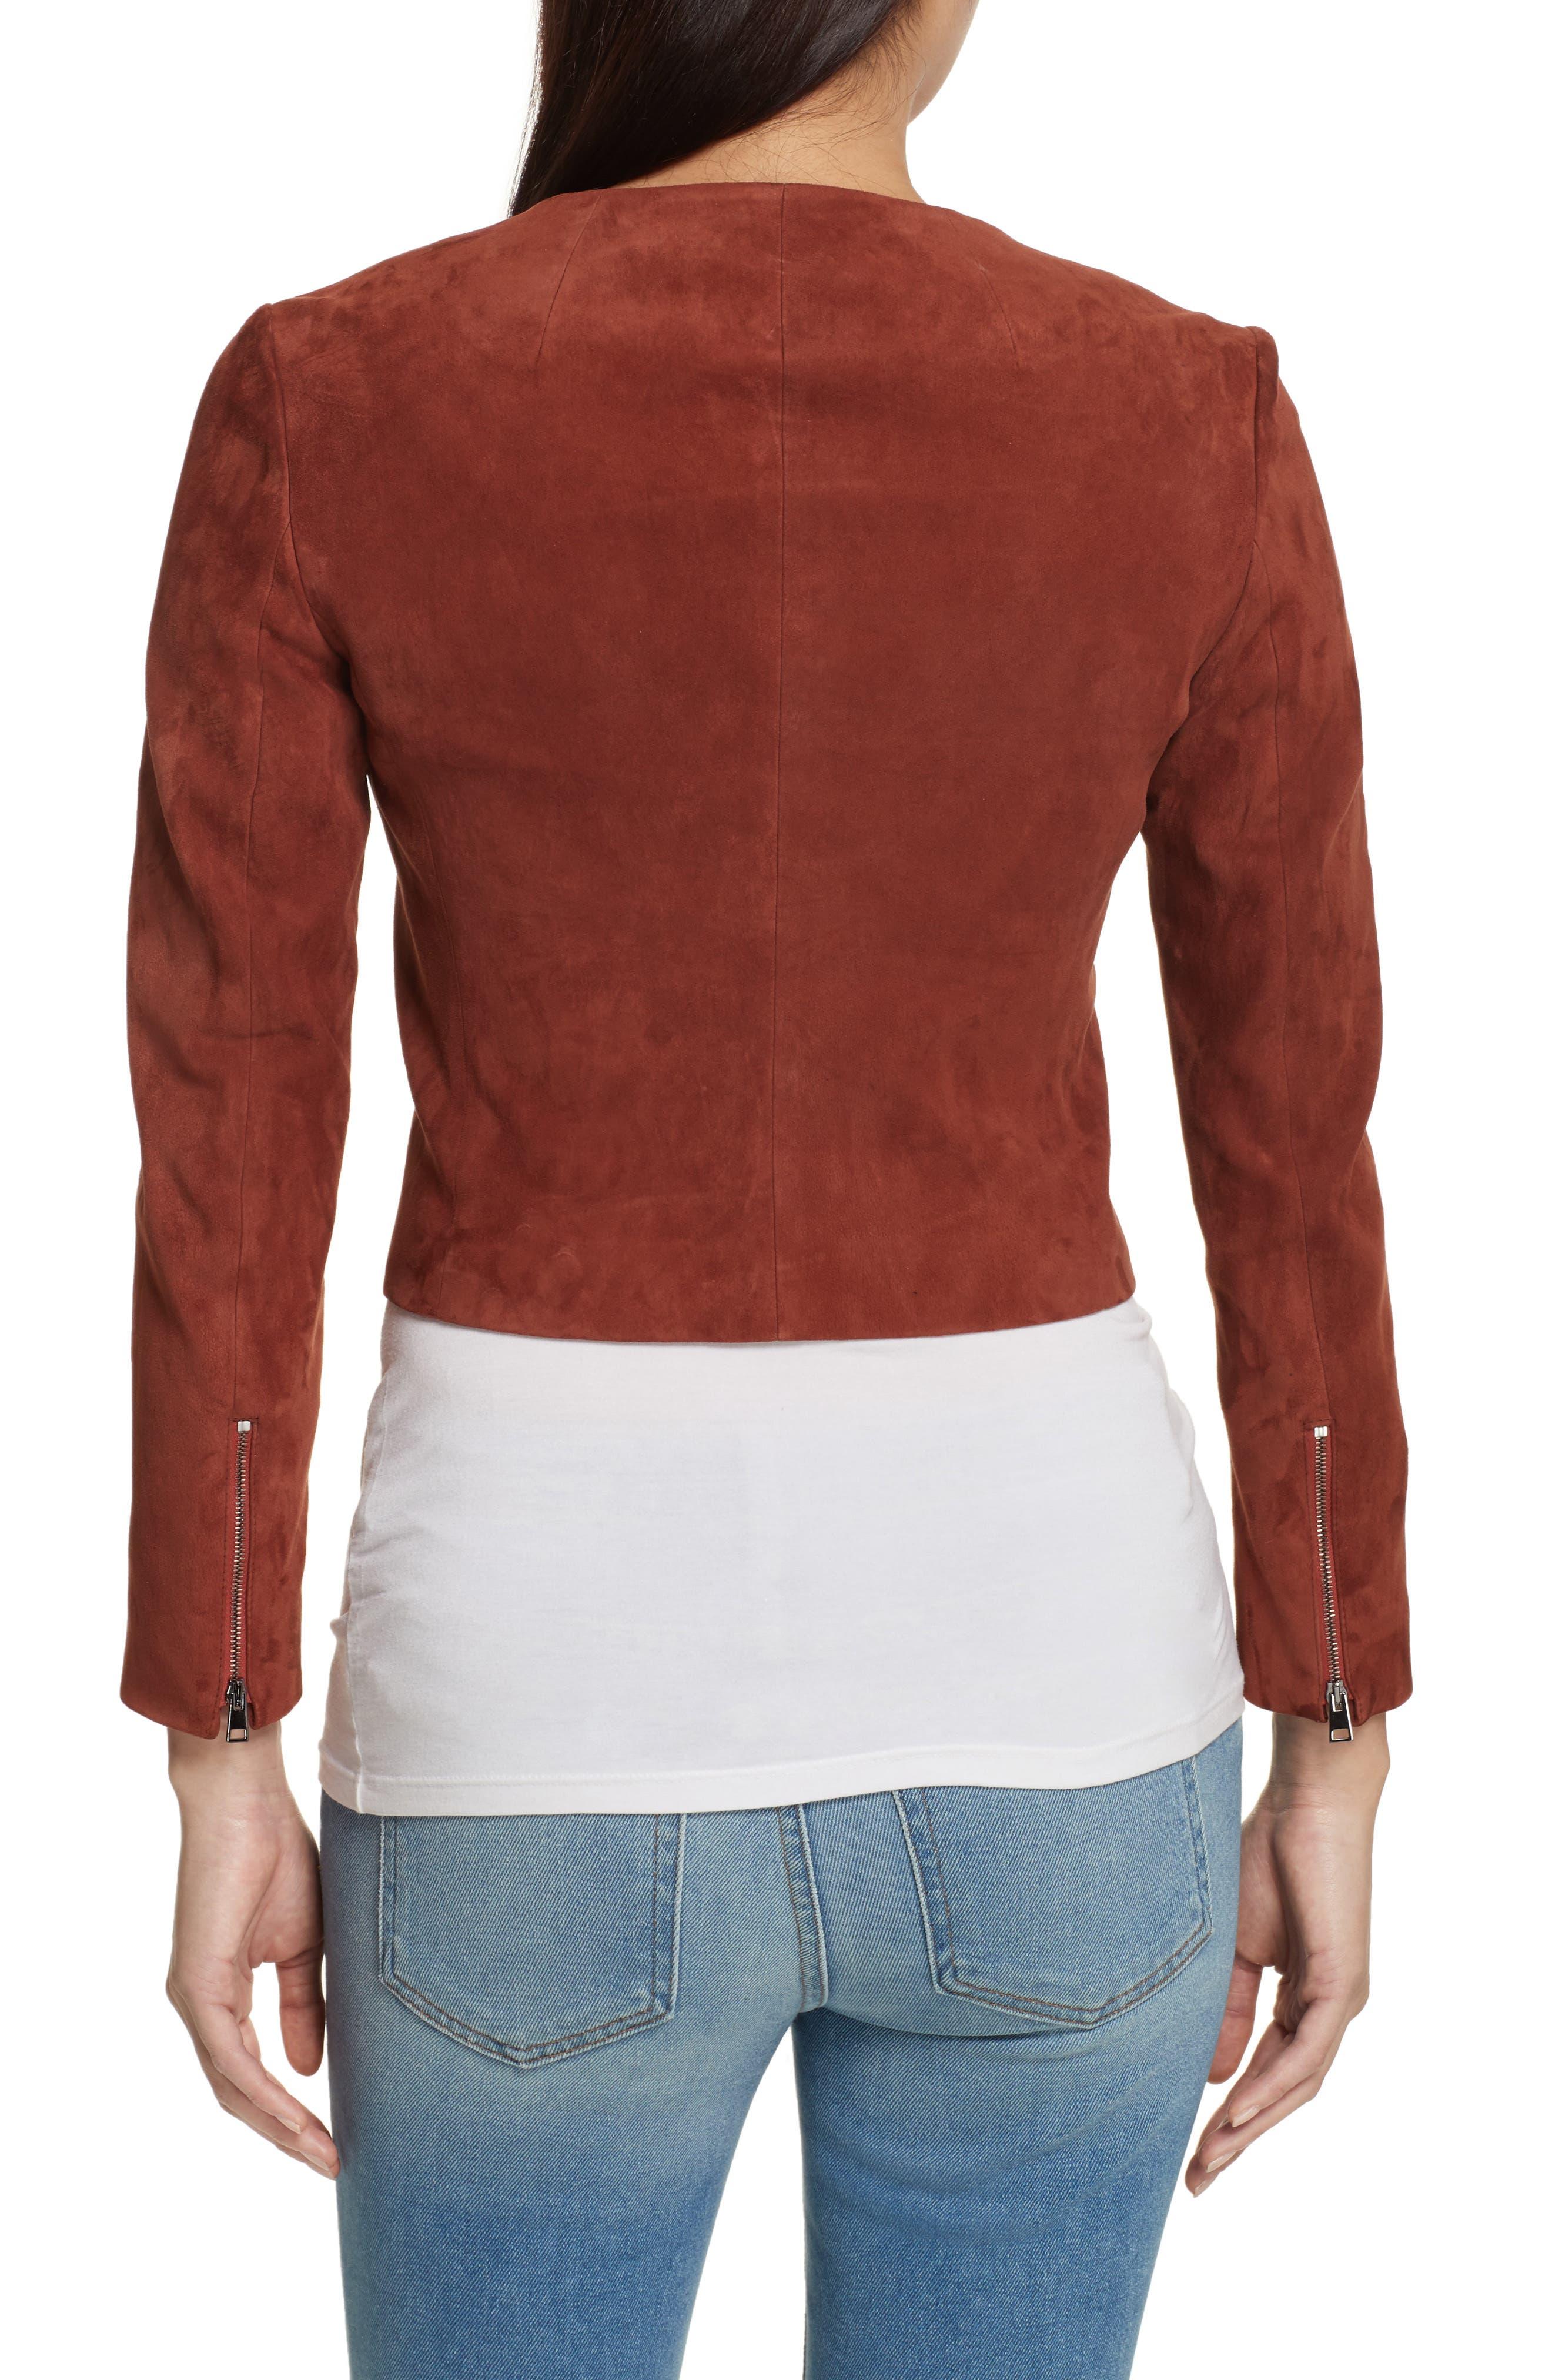 Morene Stretch Suede Jacket,                             Alternate thumbnail 2, color,                             Brown Russet